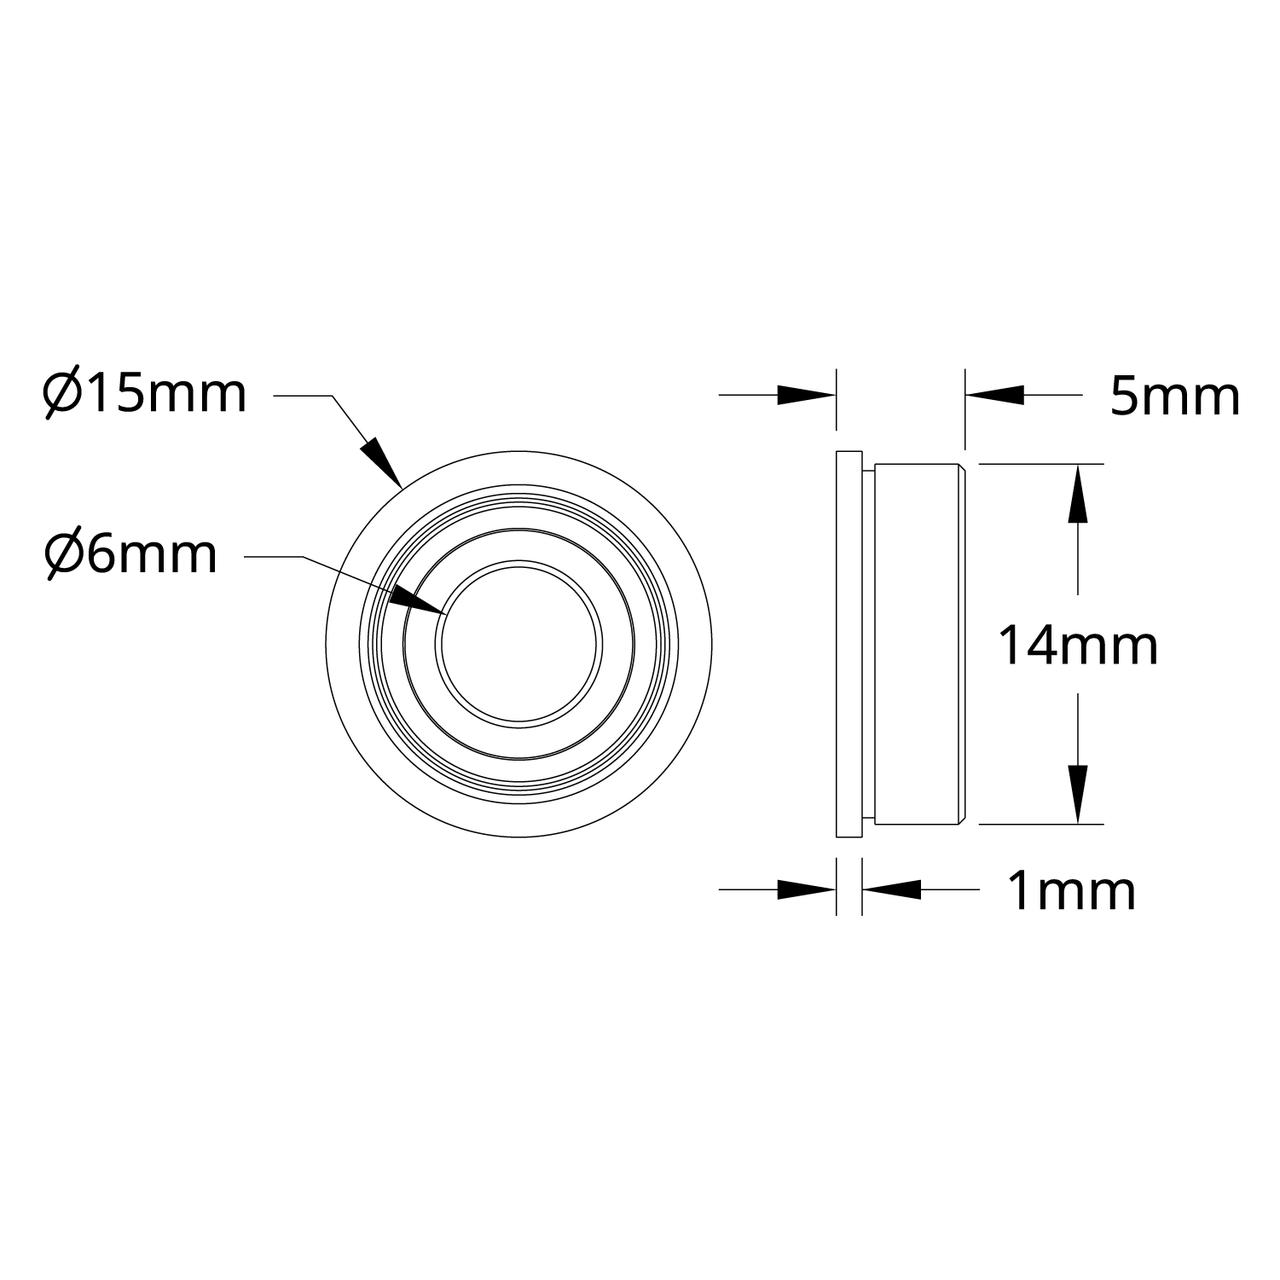 14 Generation 1 Xmods 3mm x 6mm x 2 mm Metric Bearings